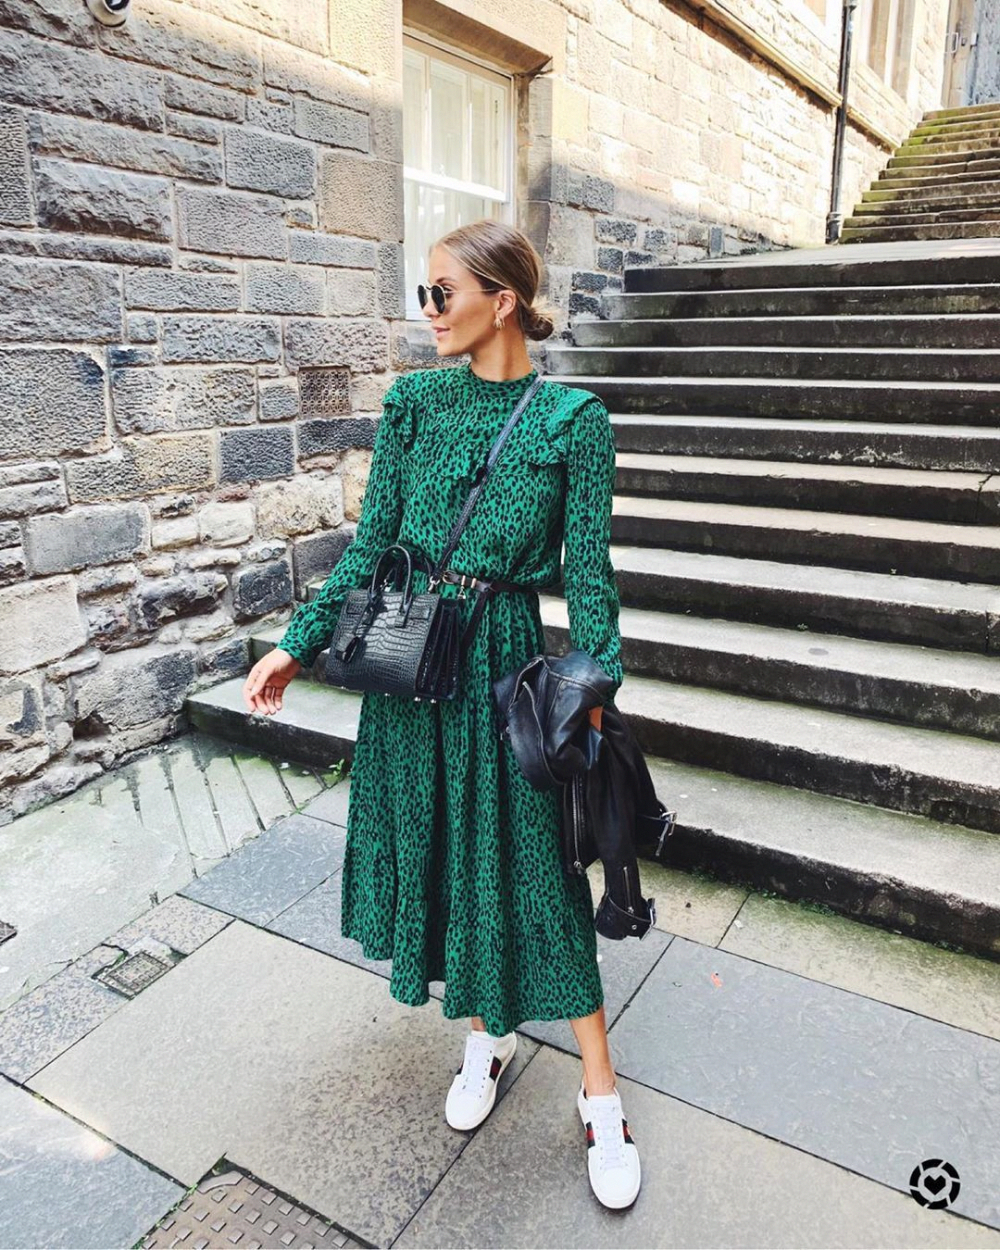 Dress Midi Dress Green Dress Leopard Print Long Sleeve Dress White Sneakers Black Bag Black Leather Jacket Midi Dress Outfit Fashion Midi Dress Casual [ 1250 x 1000 Pixel ]